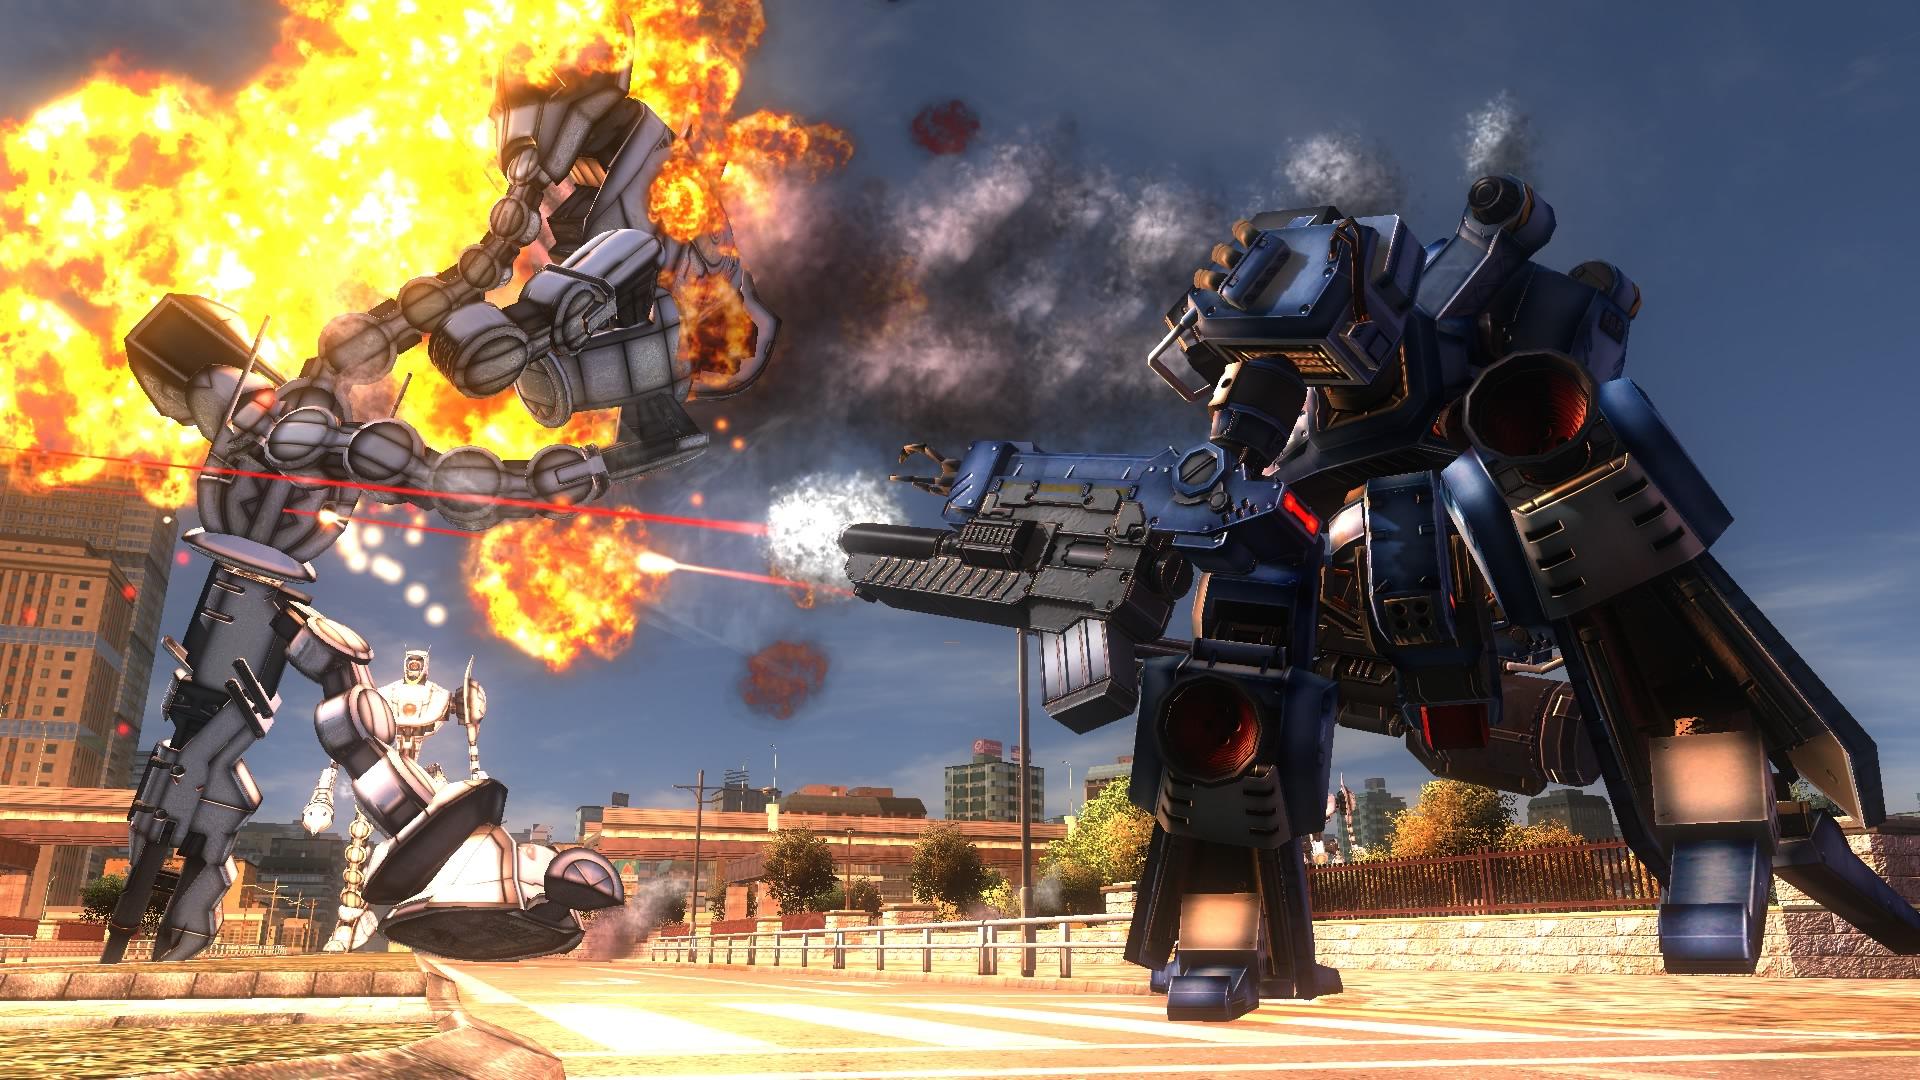 Chequea el nuevo Gameplay de Earth Defense Force 5-frikigamers.com